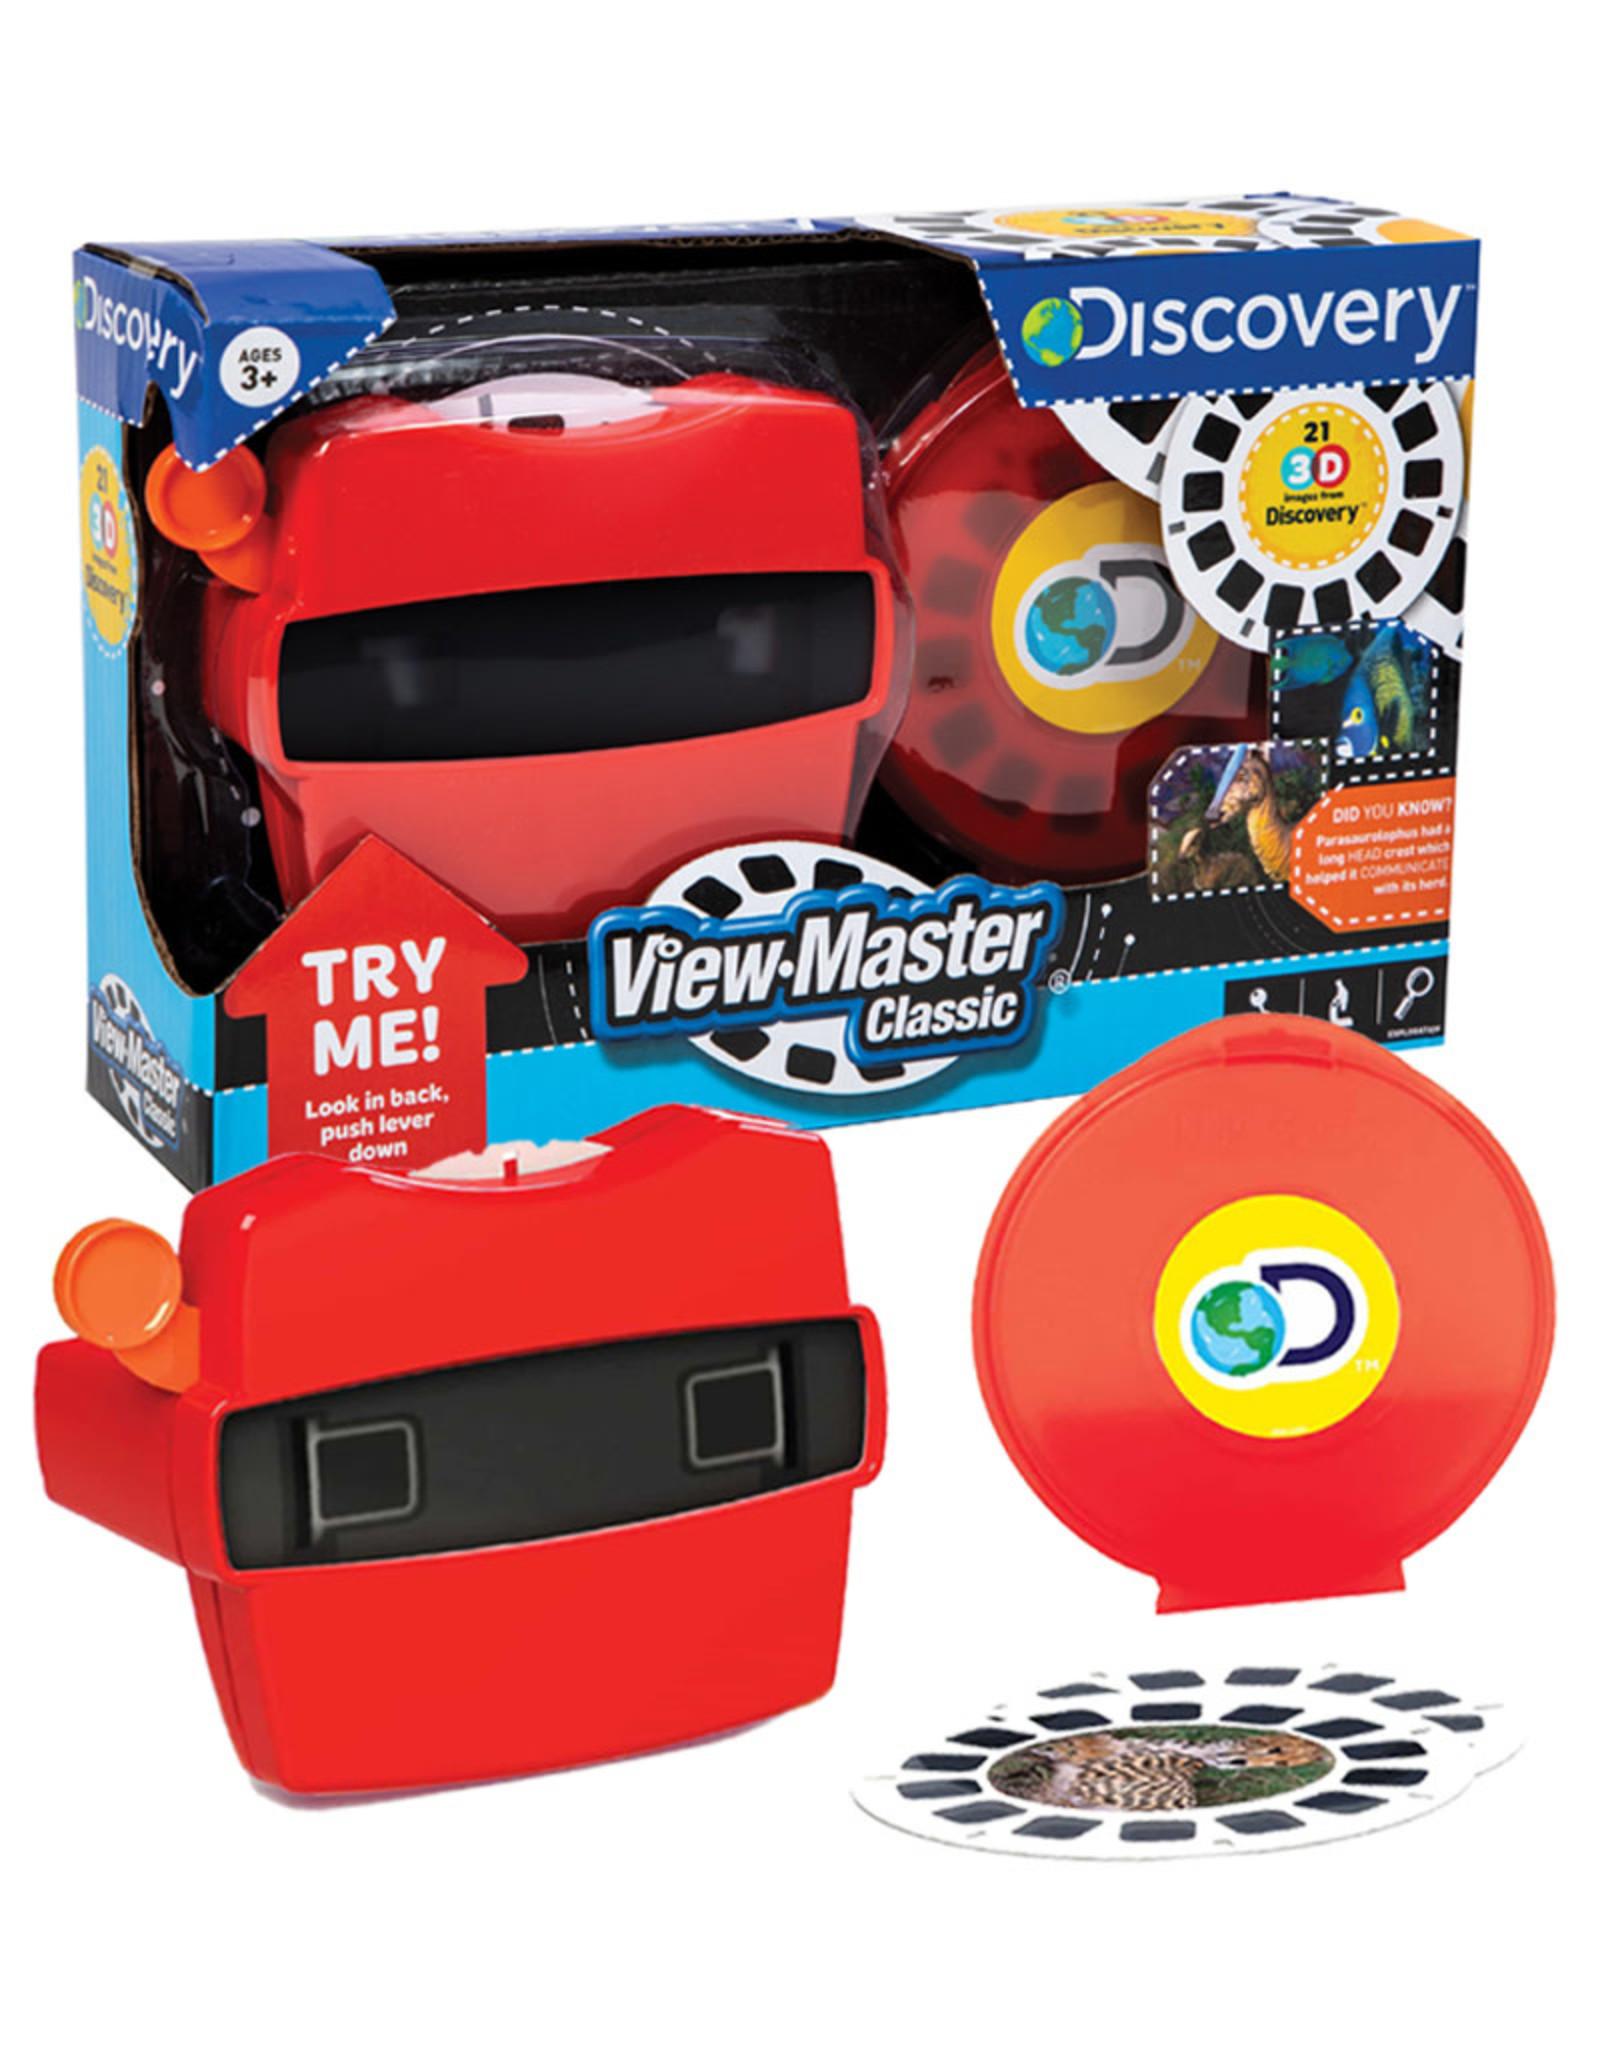 View-Master Classic  ( Retro Toy )